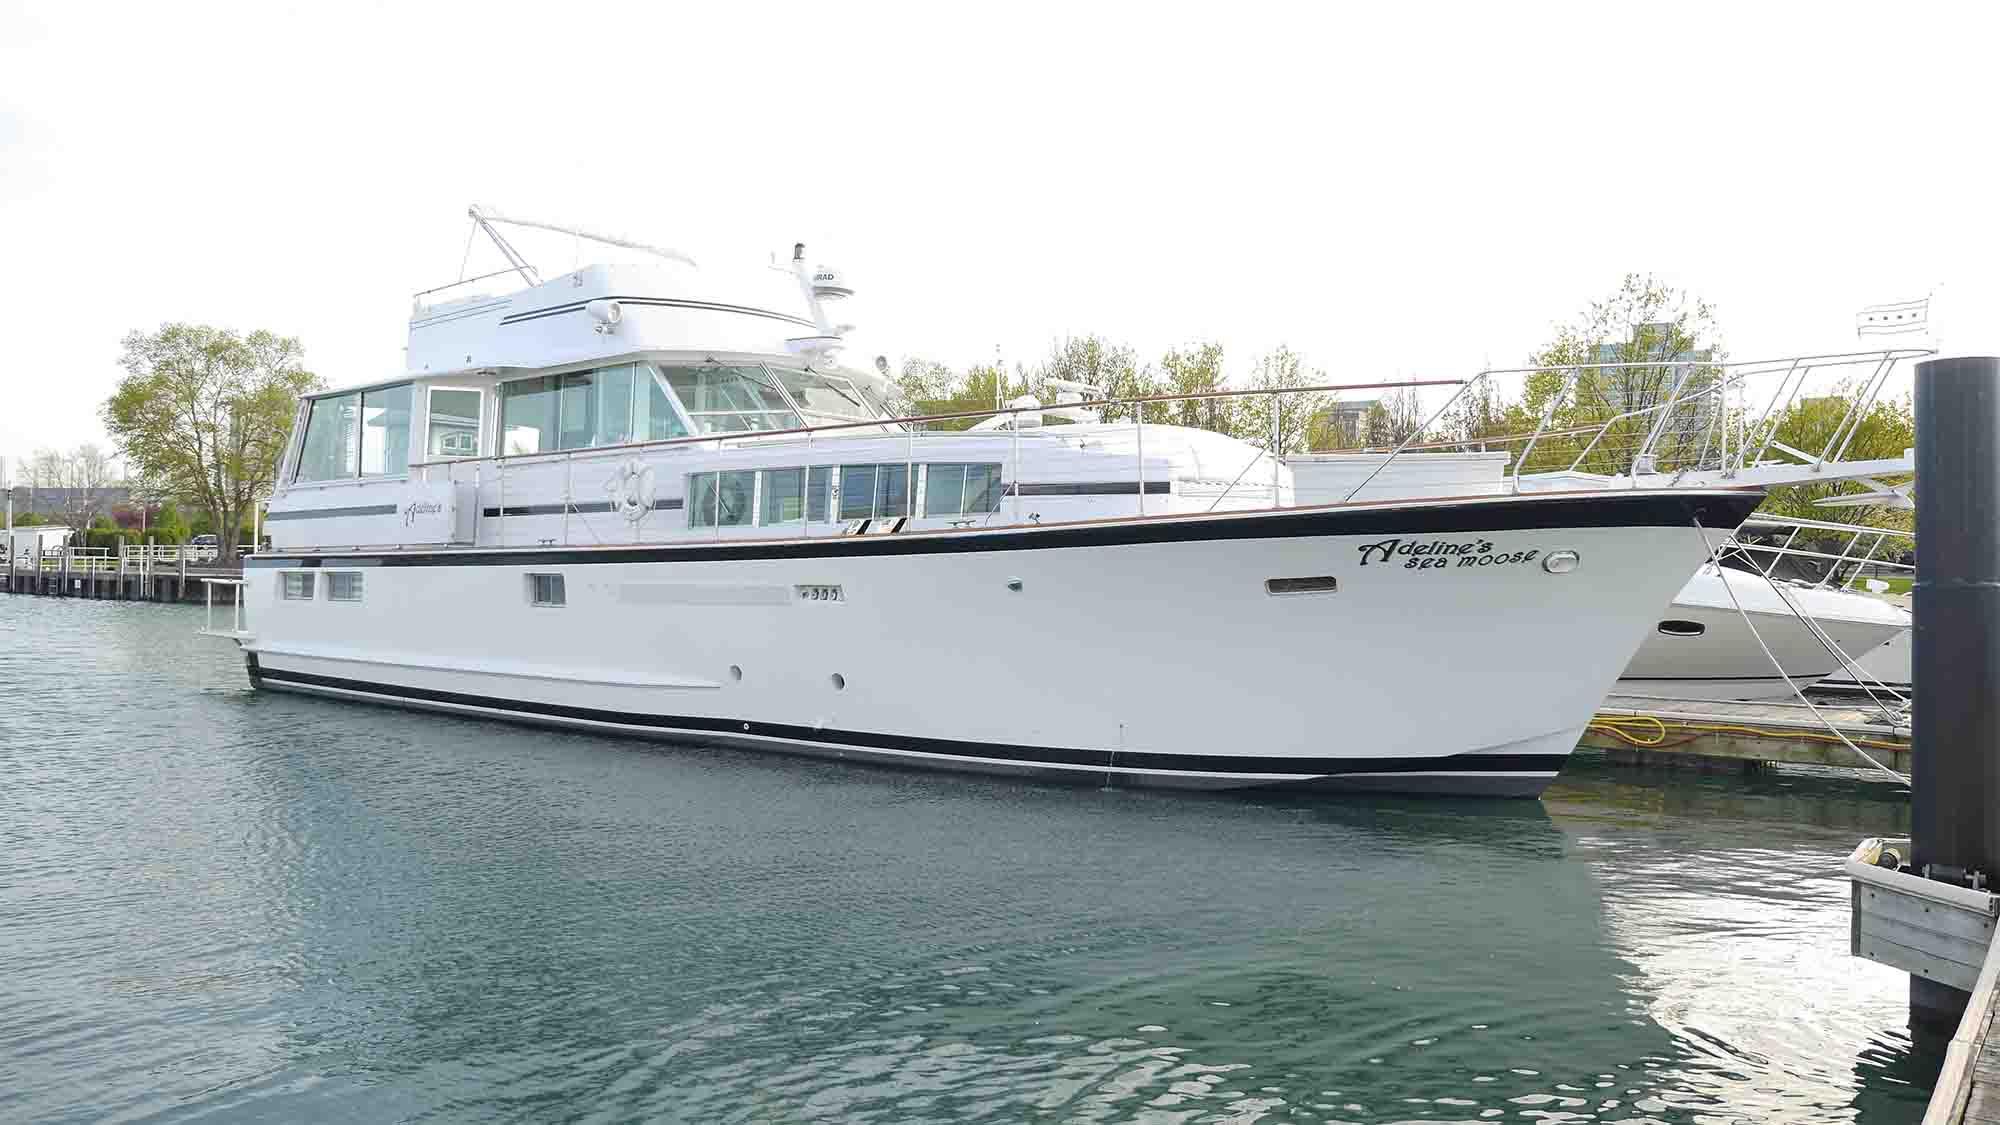 Adeline's Sea Moose premier Chicago private yacht rental